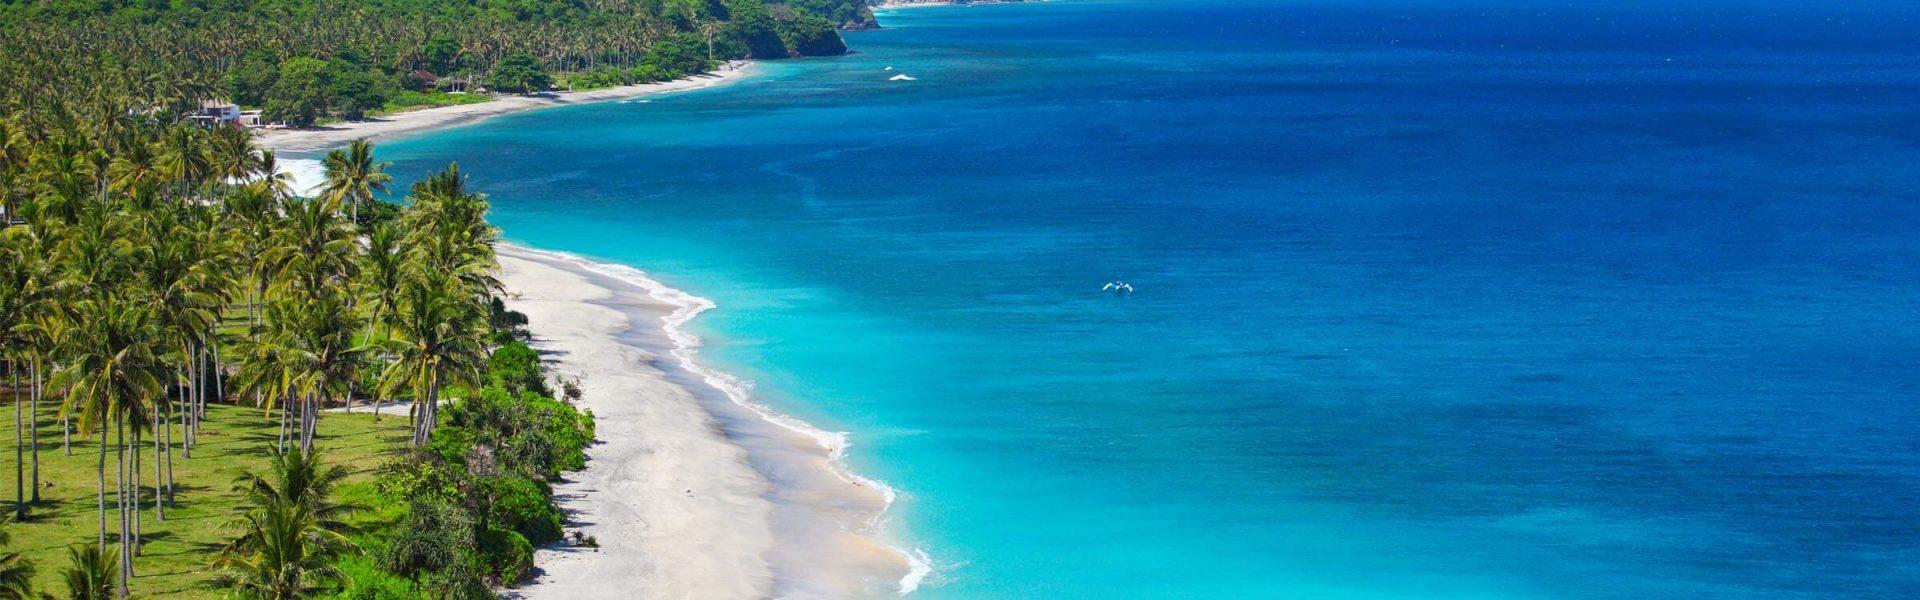 Objek Wisata Pantai